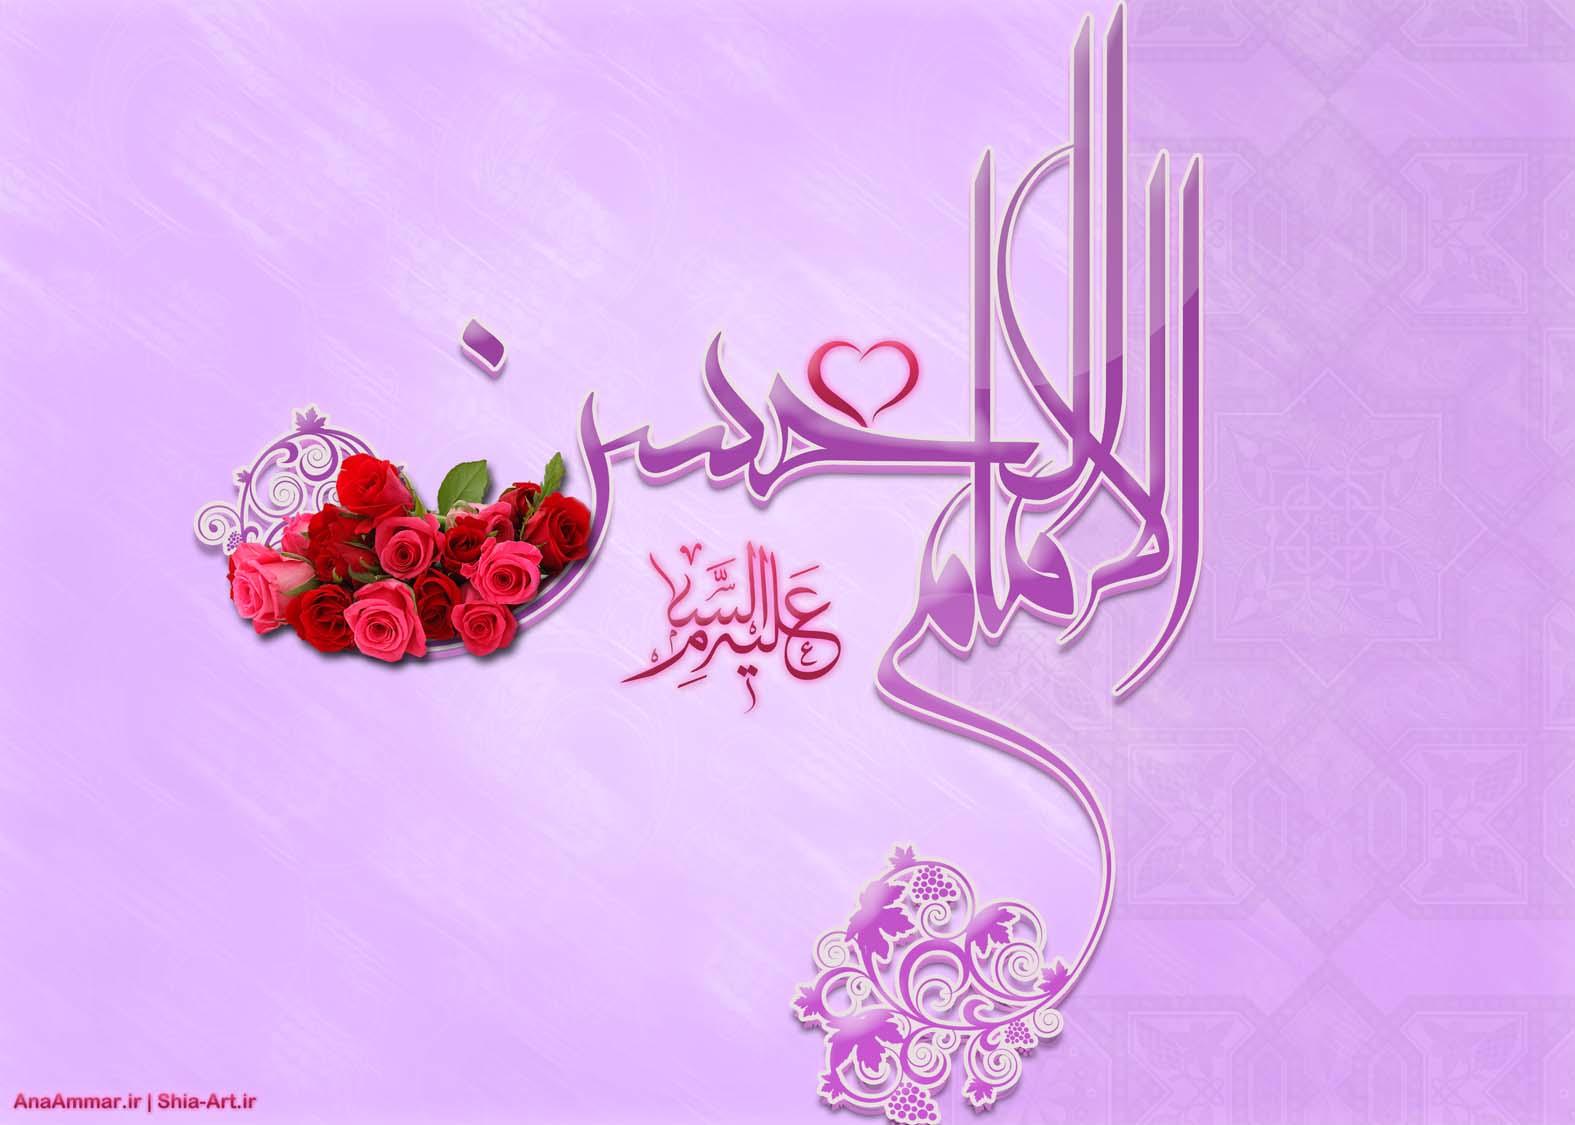 بنر و پوستر ولادت امام حسن مجتبی (ع)